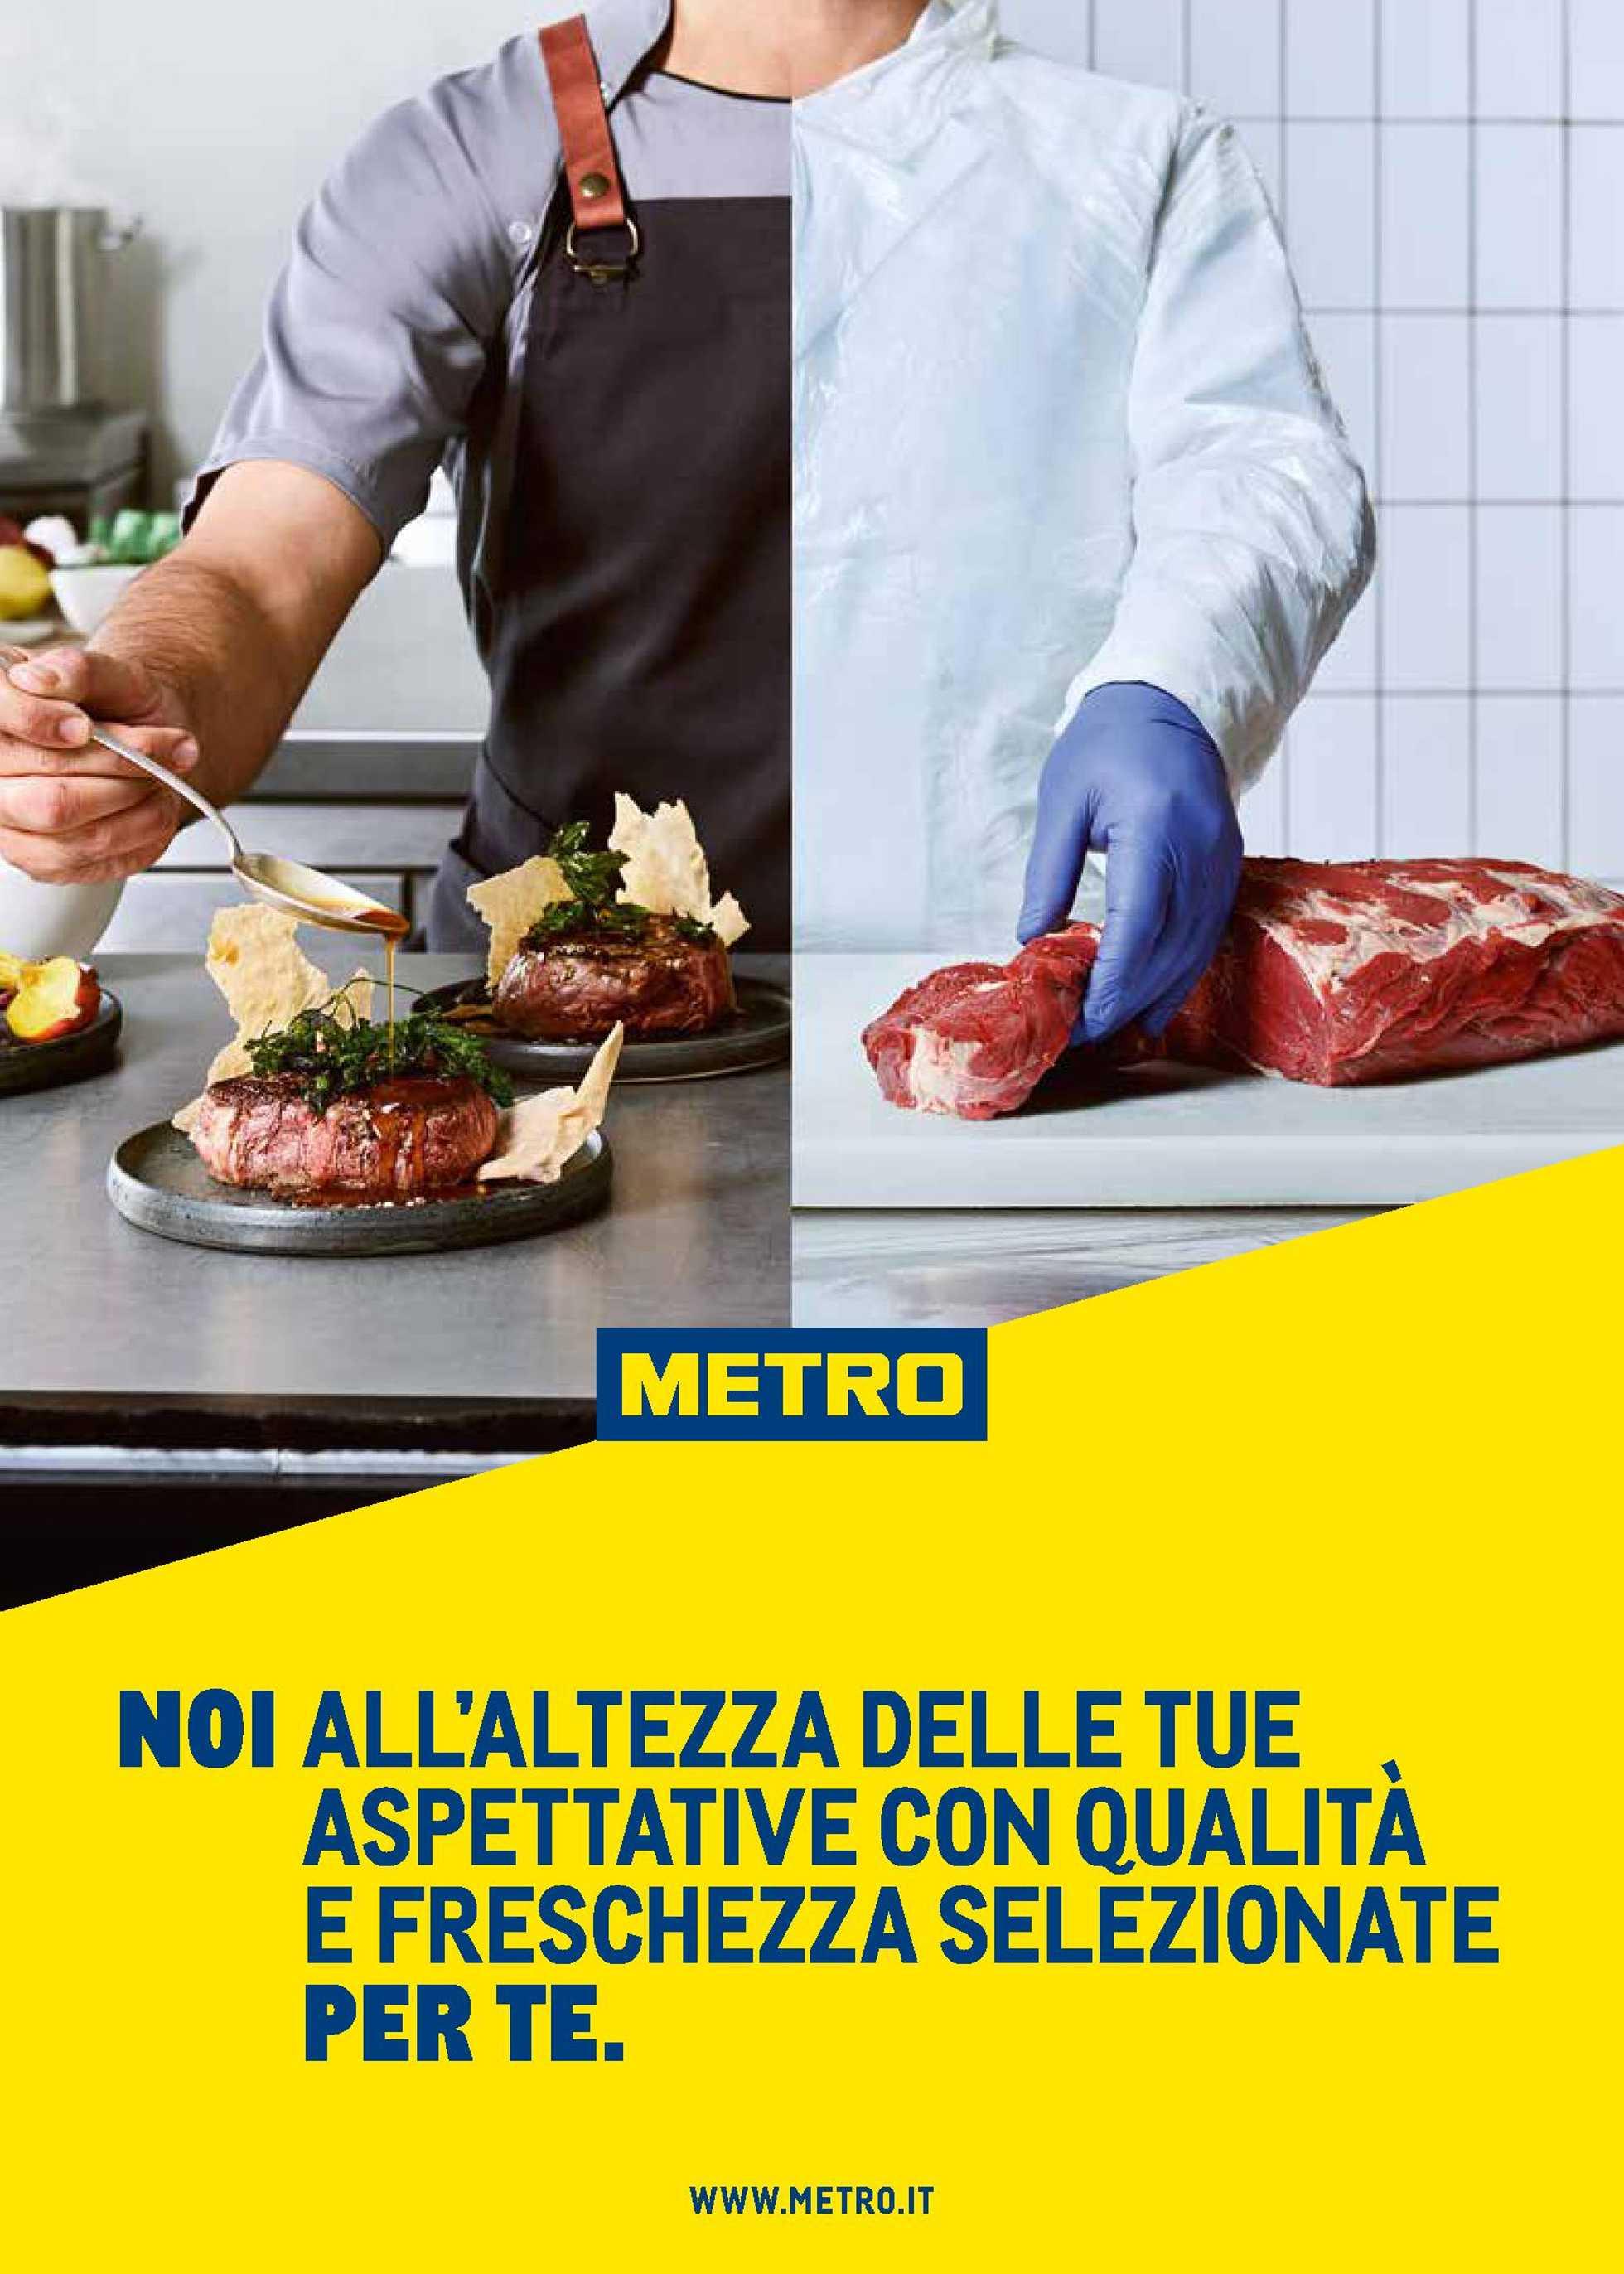 Metro - offerte valide dal 29.10.2020 al 25.11.2020 - pagina 2.